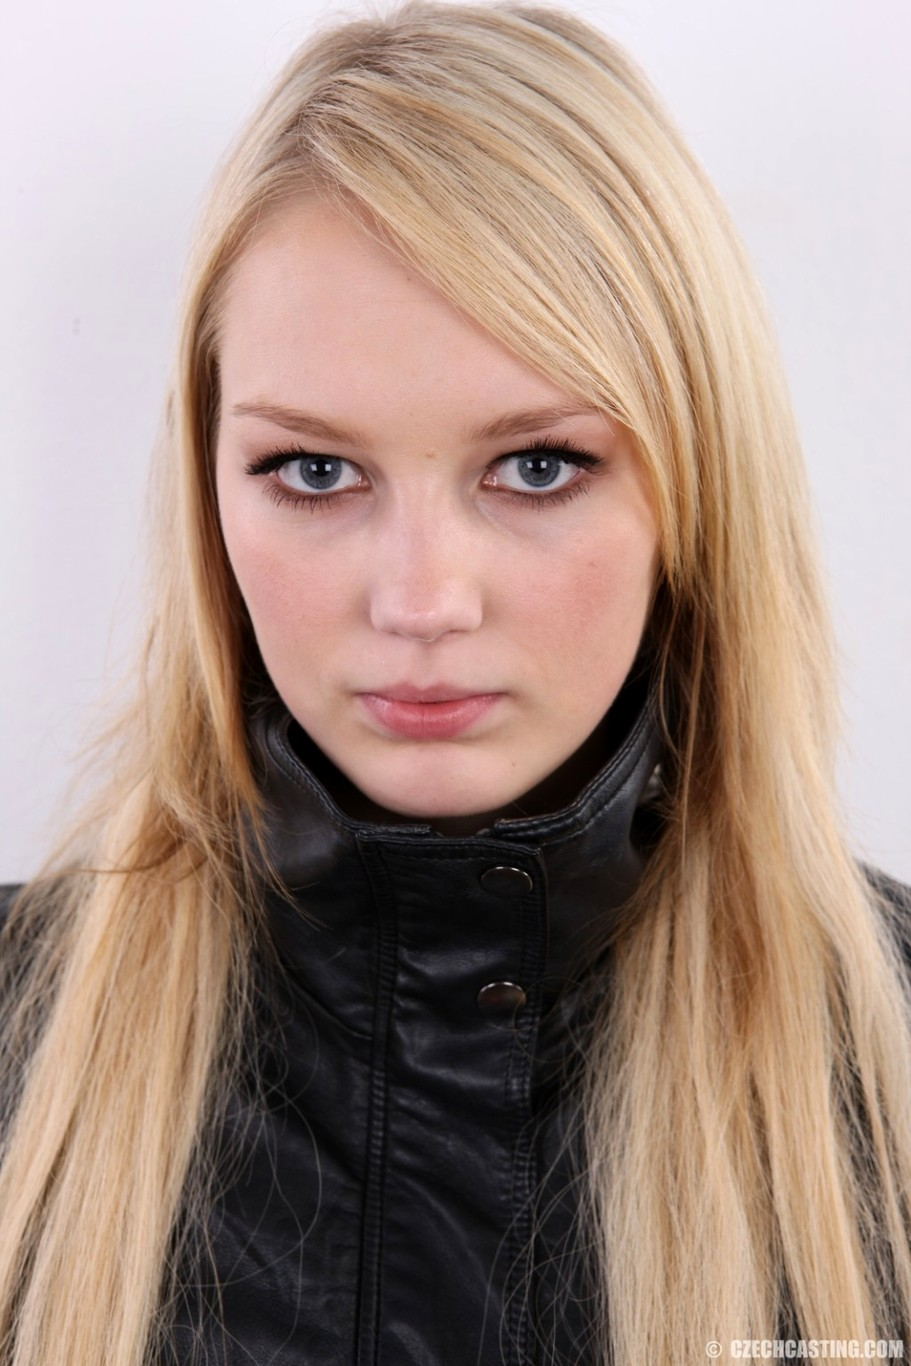 Czech casting models